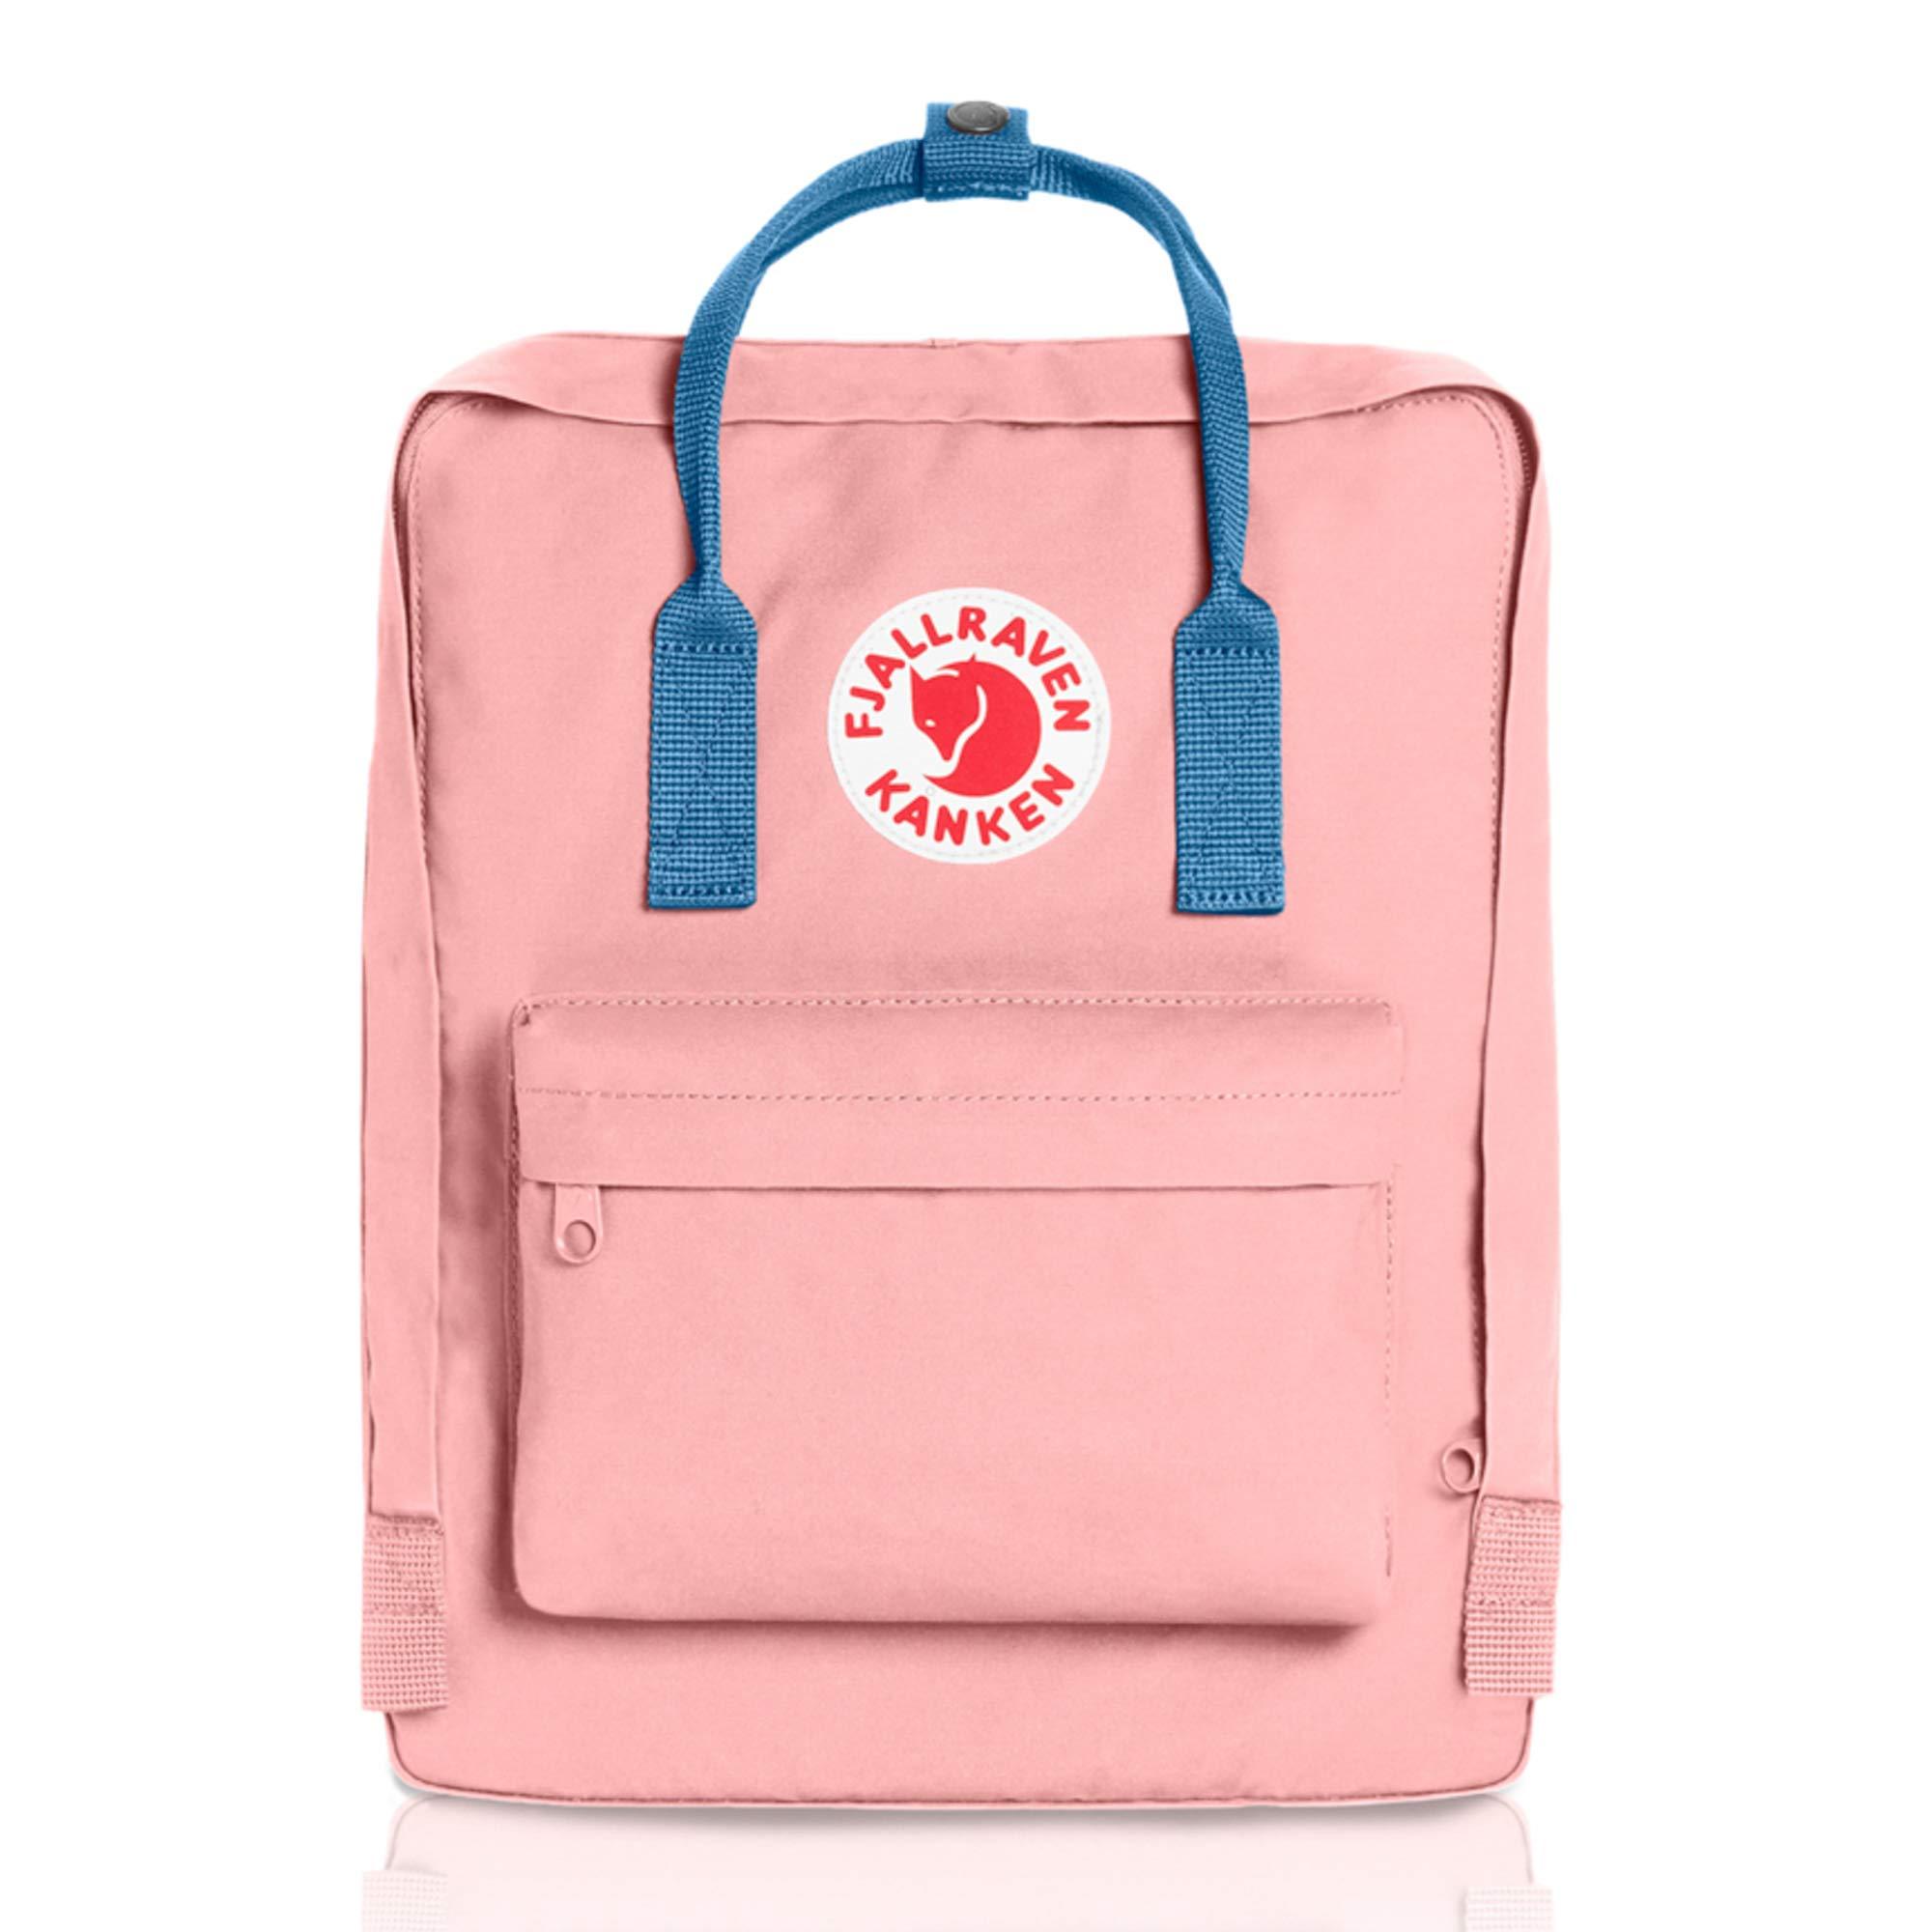 Fjallraven - Kanken Classic Backpack for Everyday, Pink/Air Blue by Fjallraven